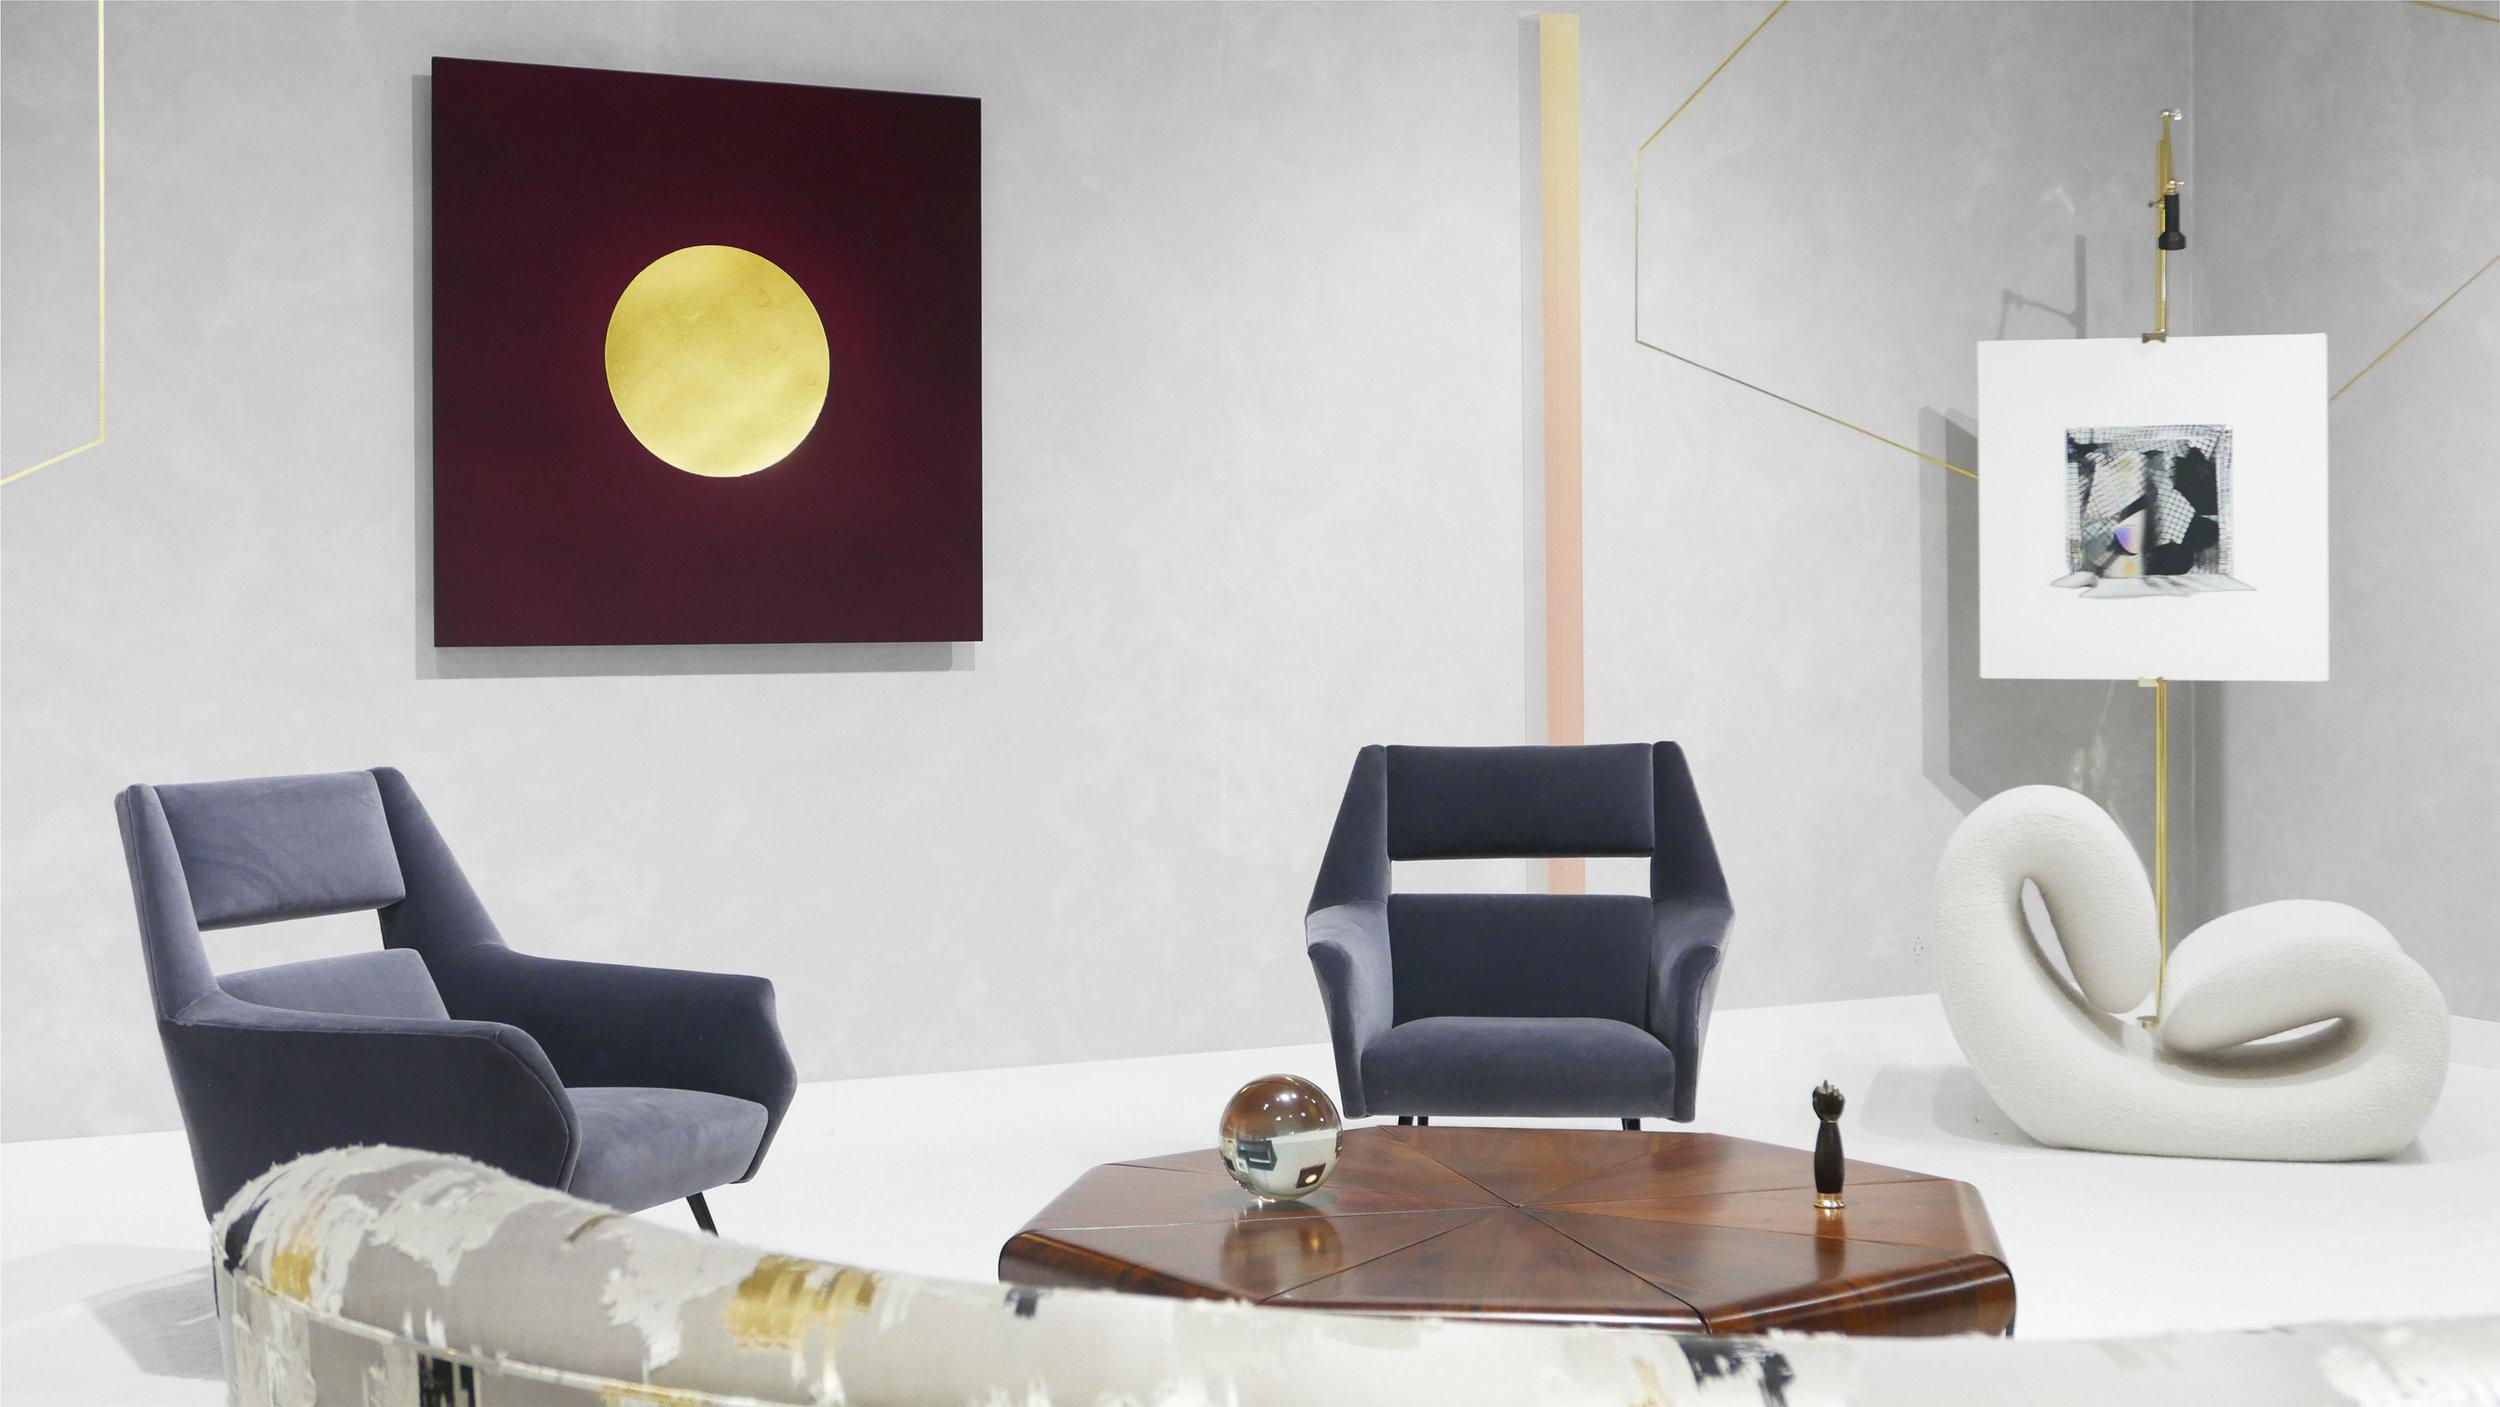 Collective Design New York 2018_Peter Blake Gallery_Installation View_4.jpg